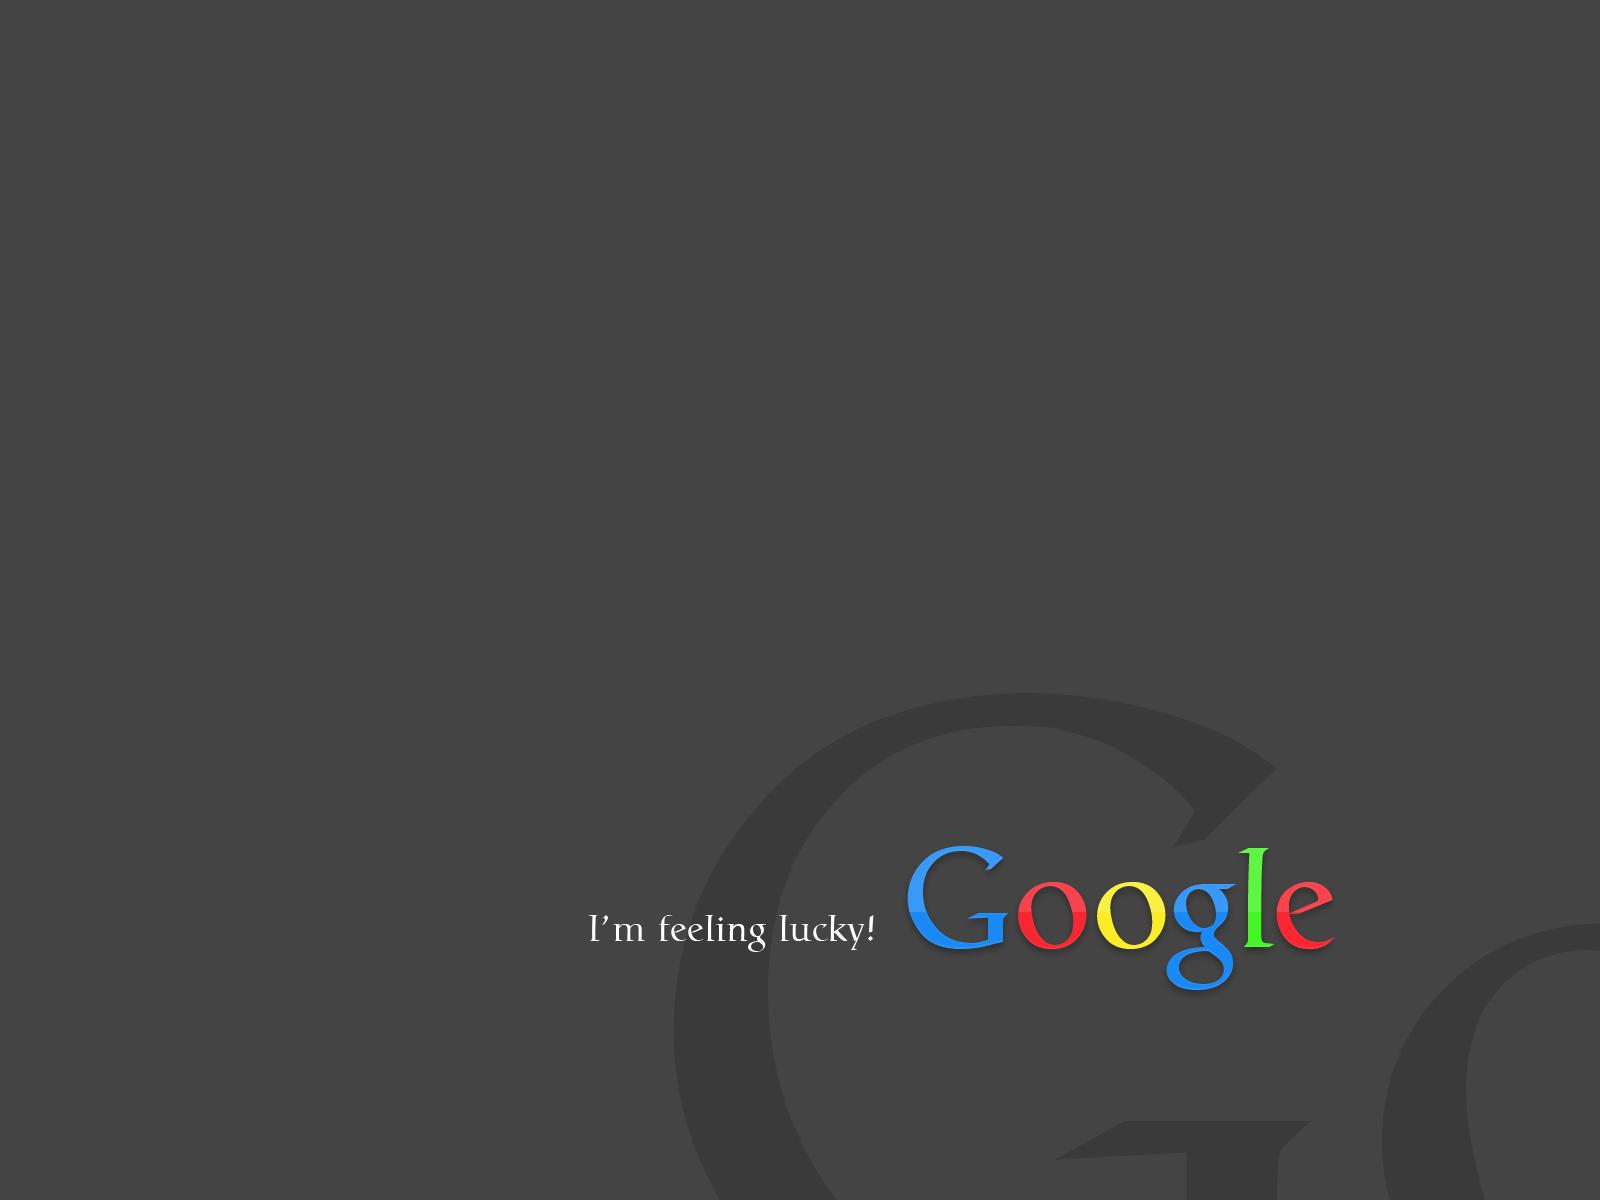 Google Wallpapers HD i